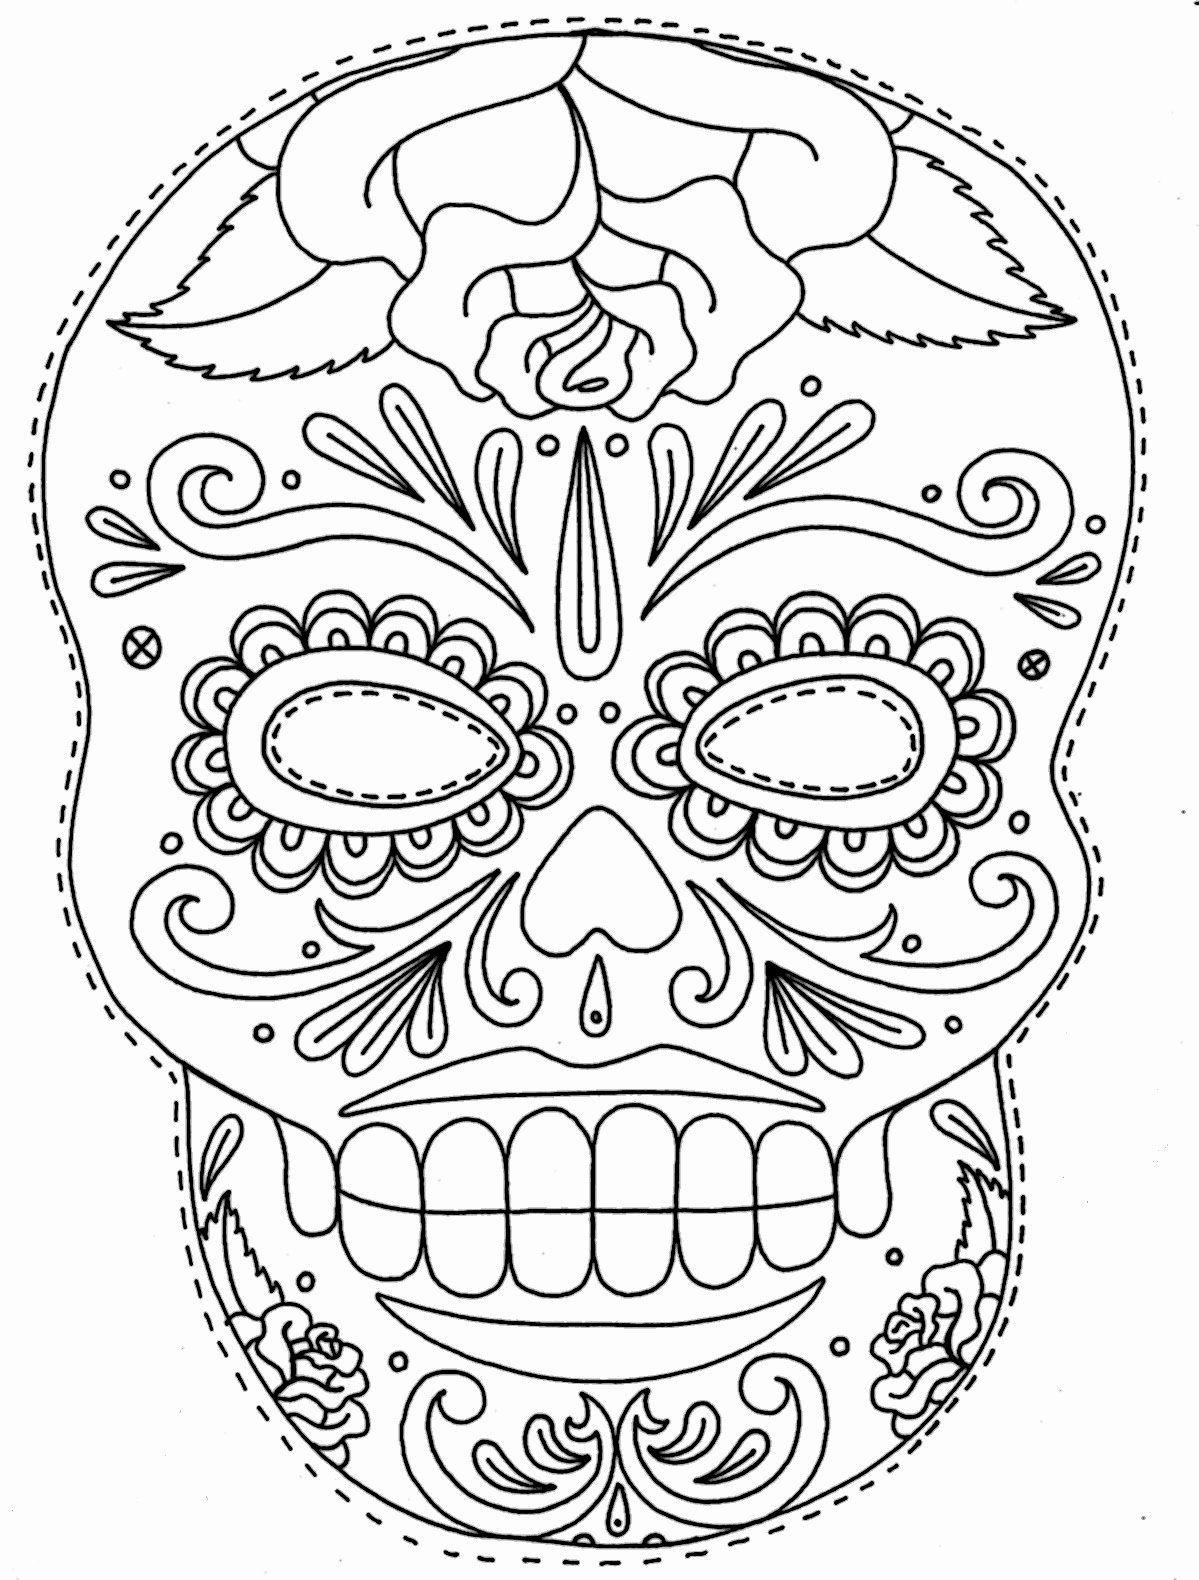 Blank Sugar Skull Template Luxury Tattoos Book 2510 Free